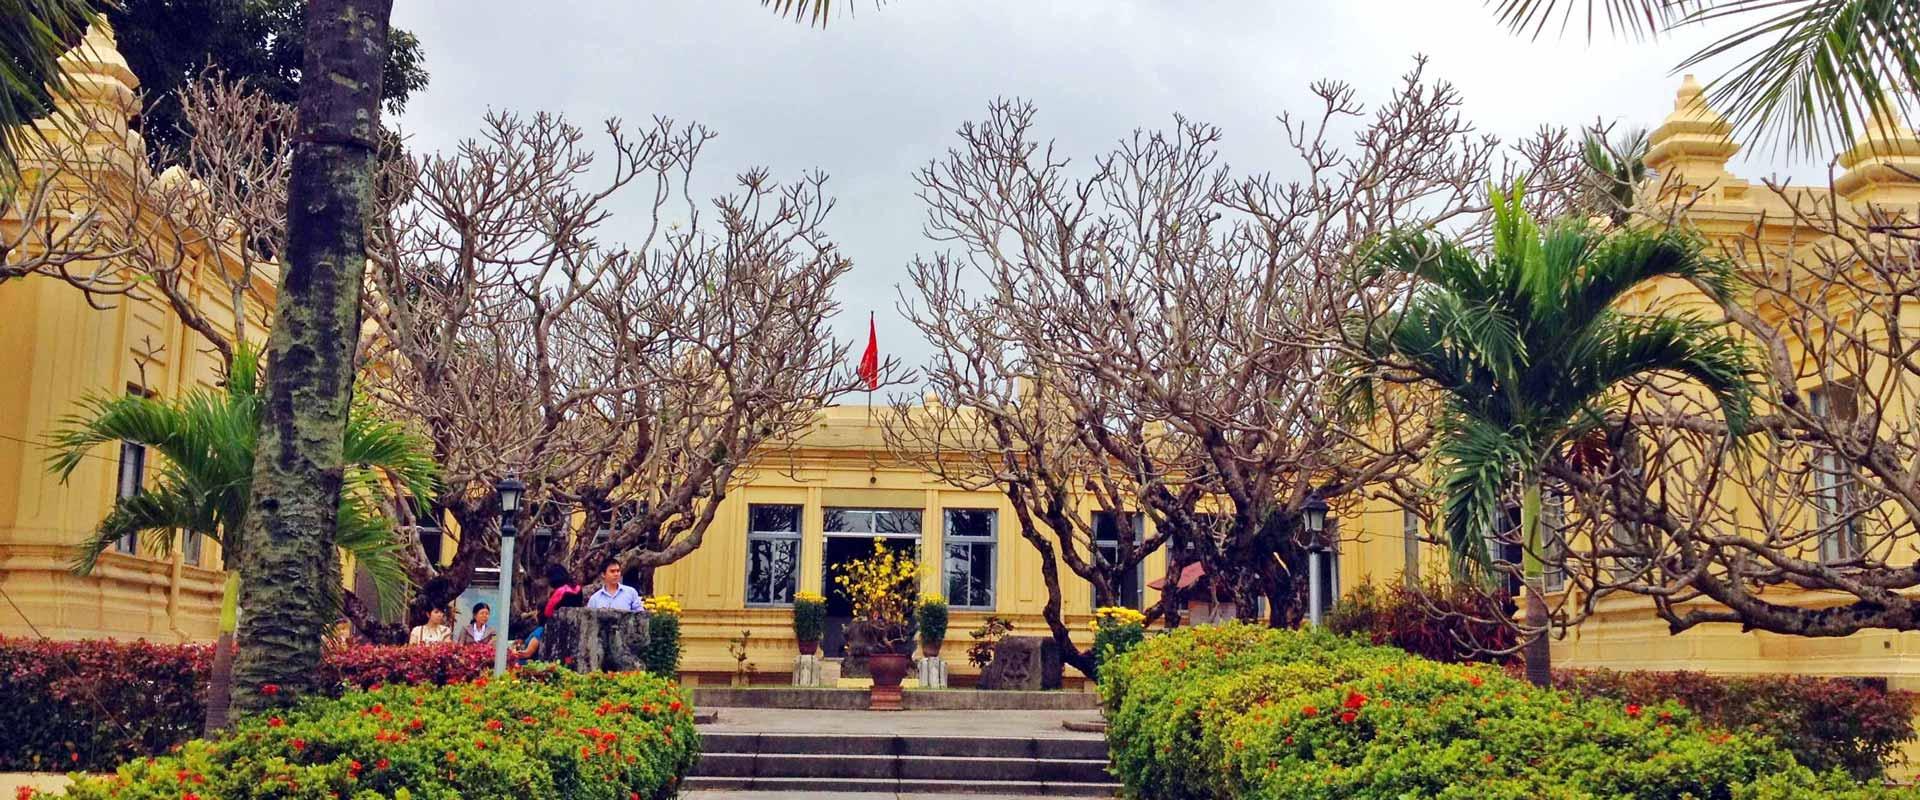 musee cham à Da Nang